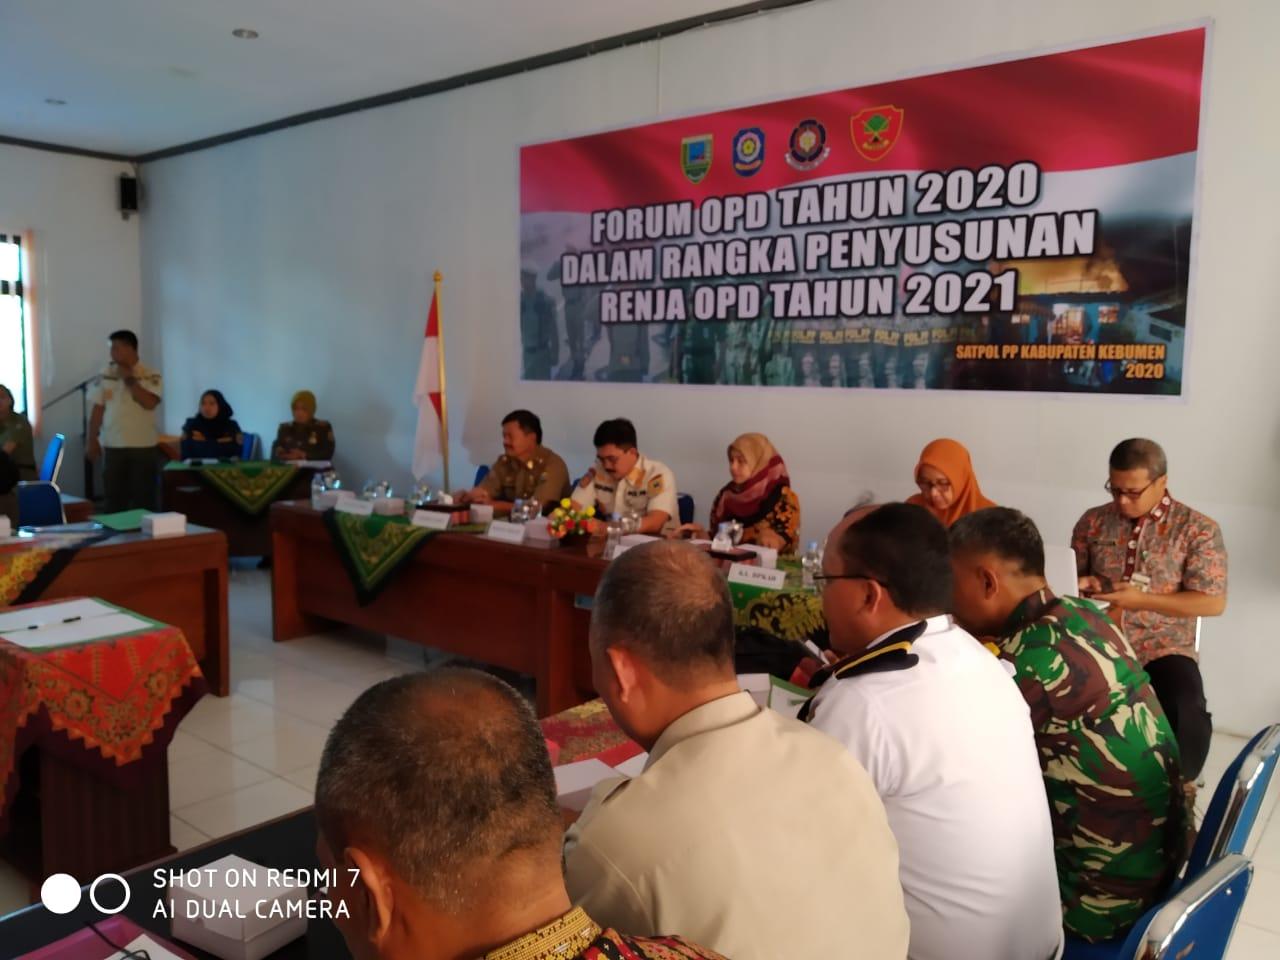 Forum OPD Satpol PP Kab. Kebumen Tahun 2020